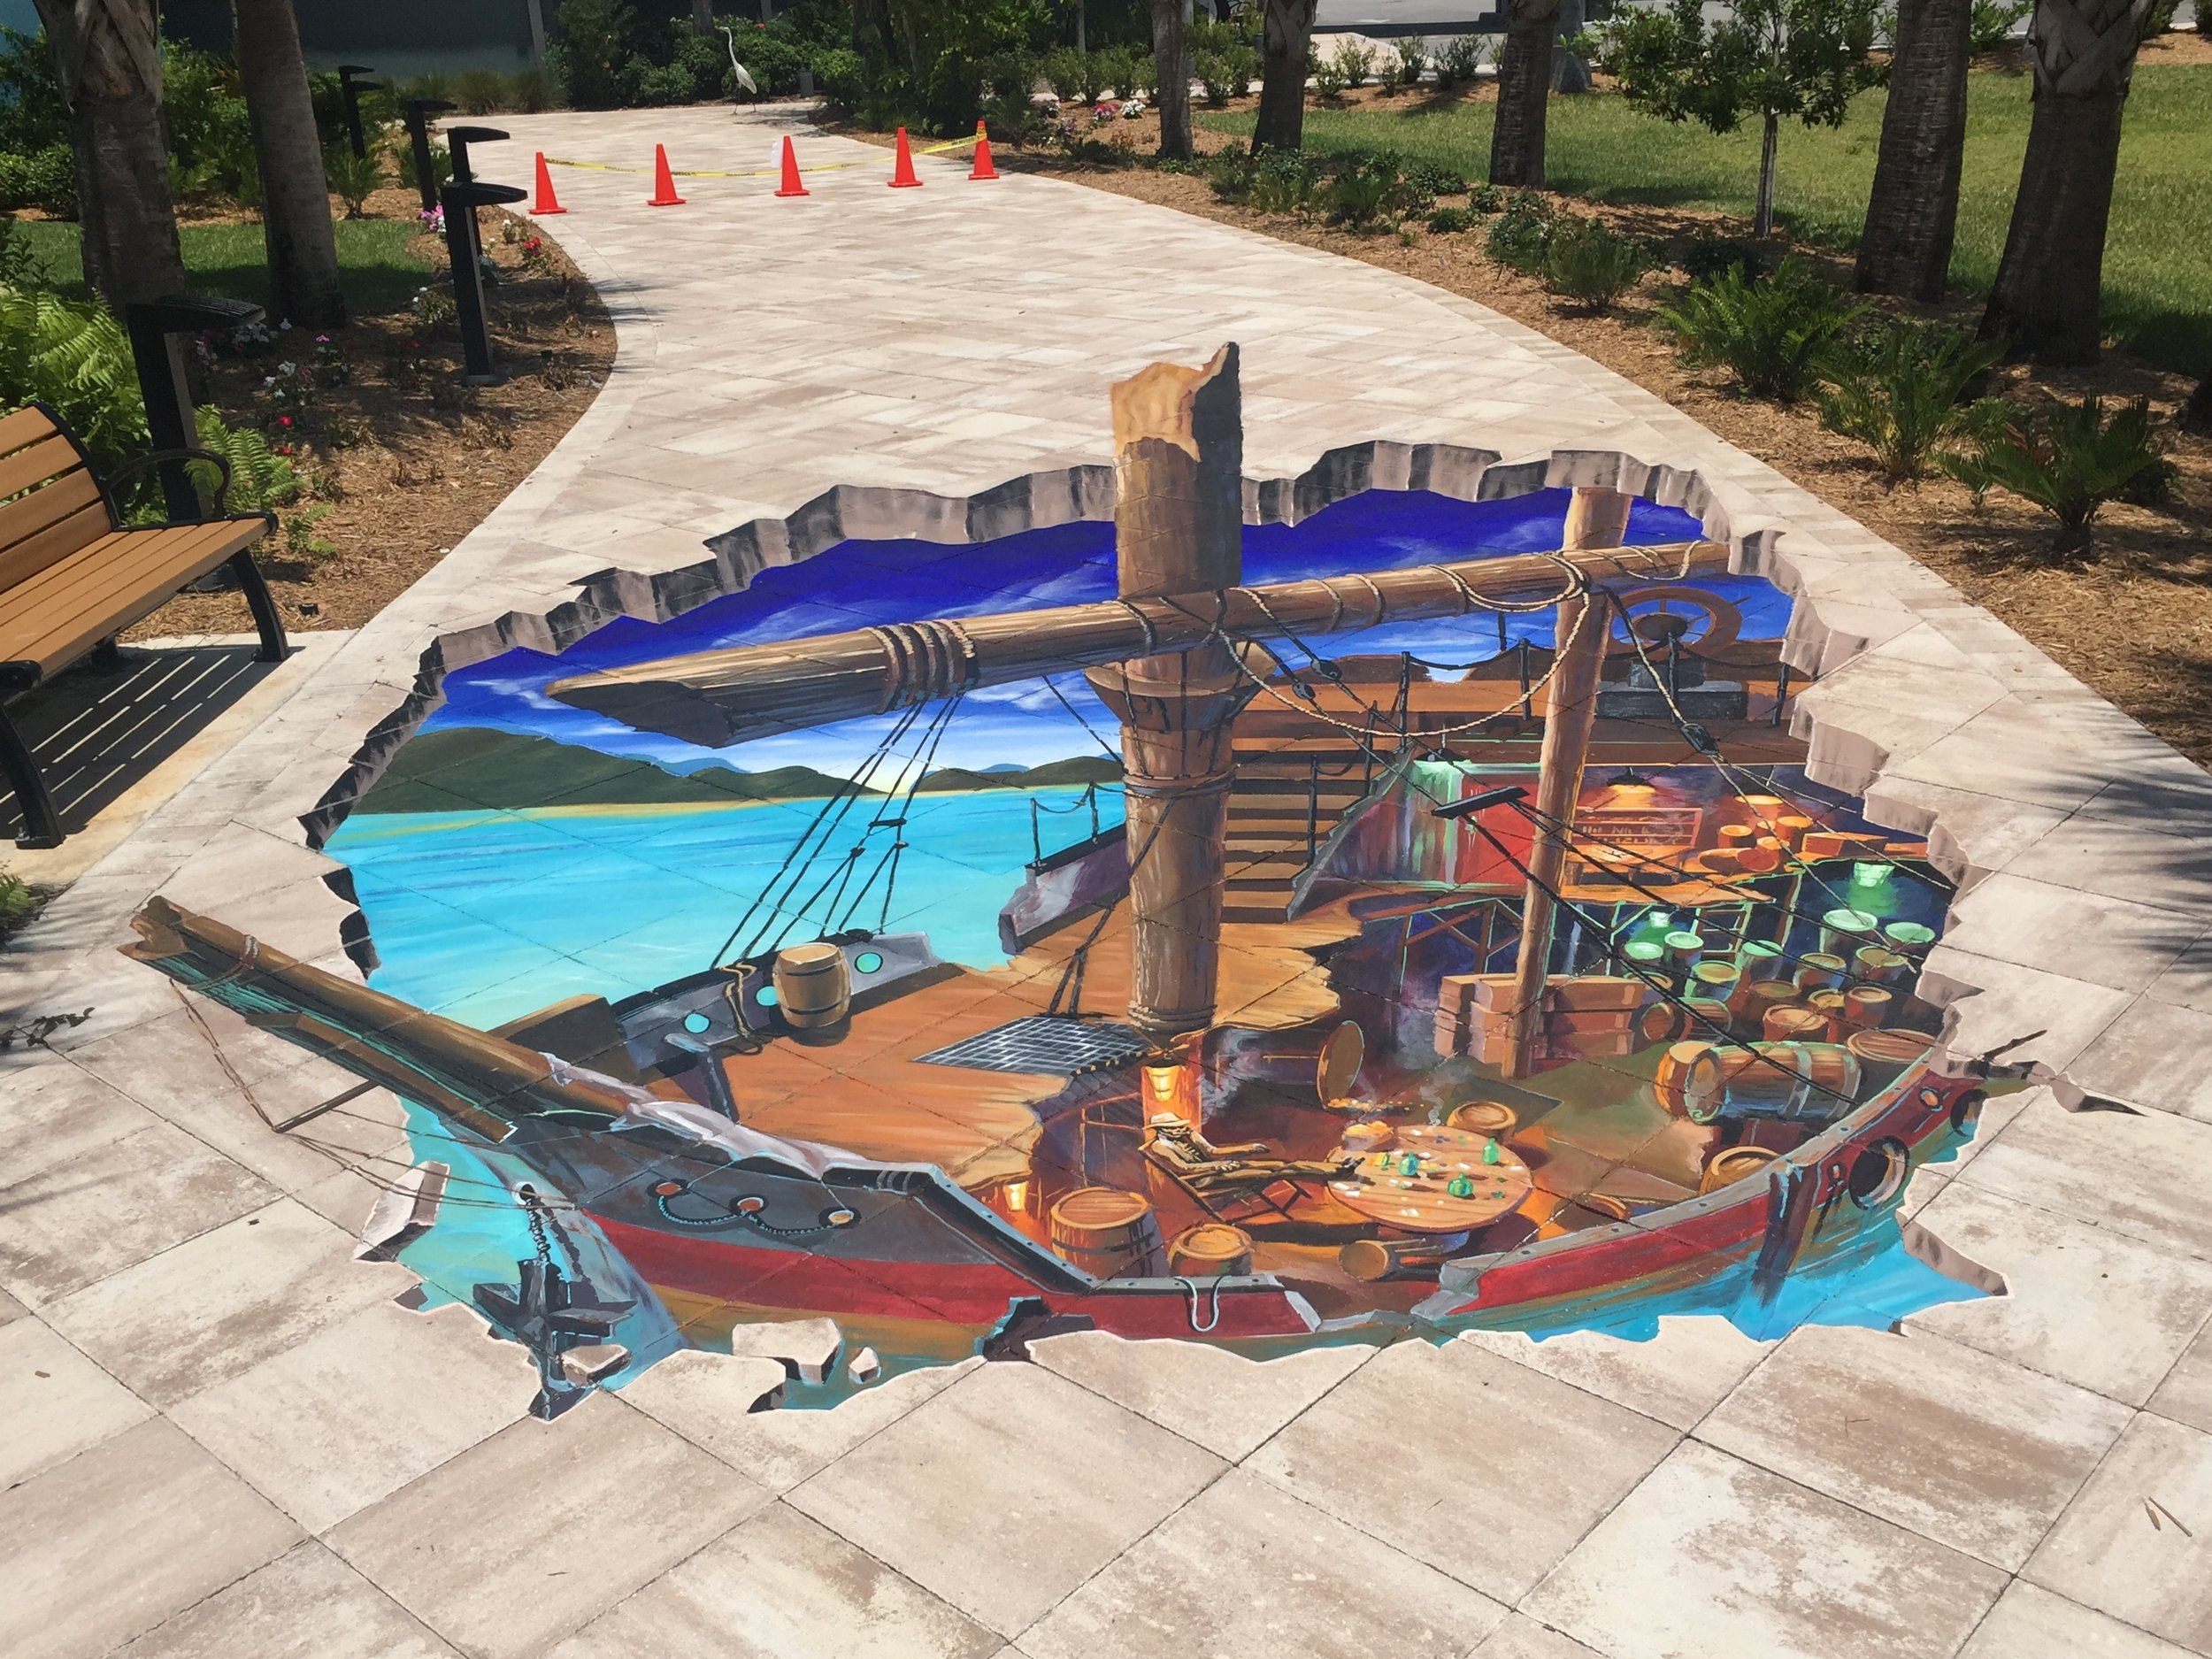 3D Street Painting: Shipwreck